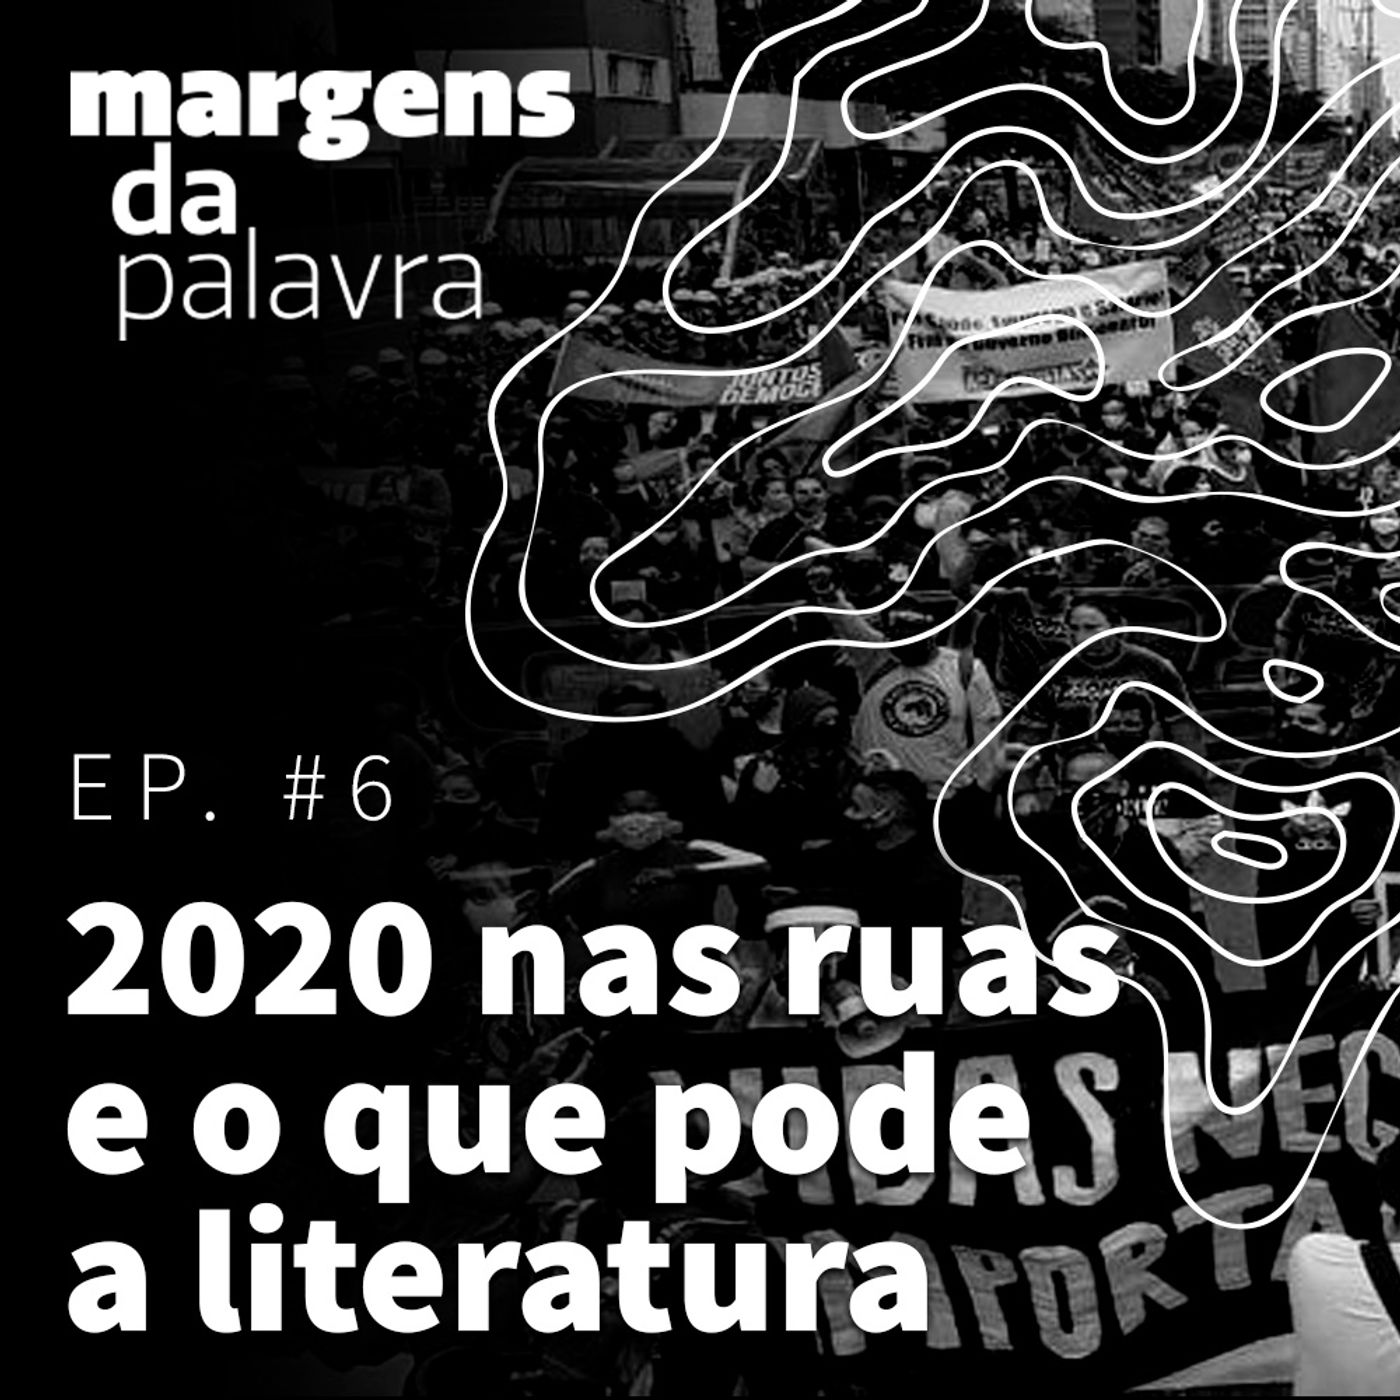 2020 nas ruas e o que pode a literatura